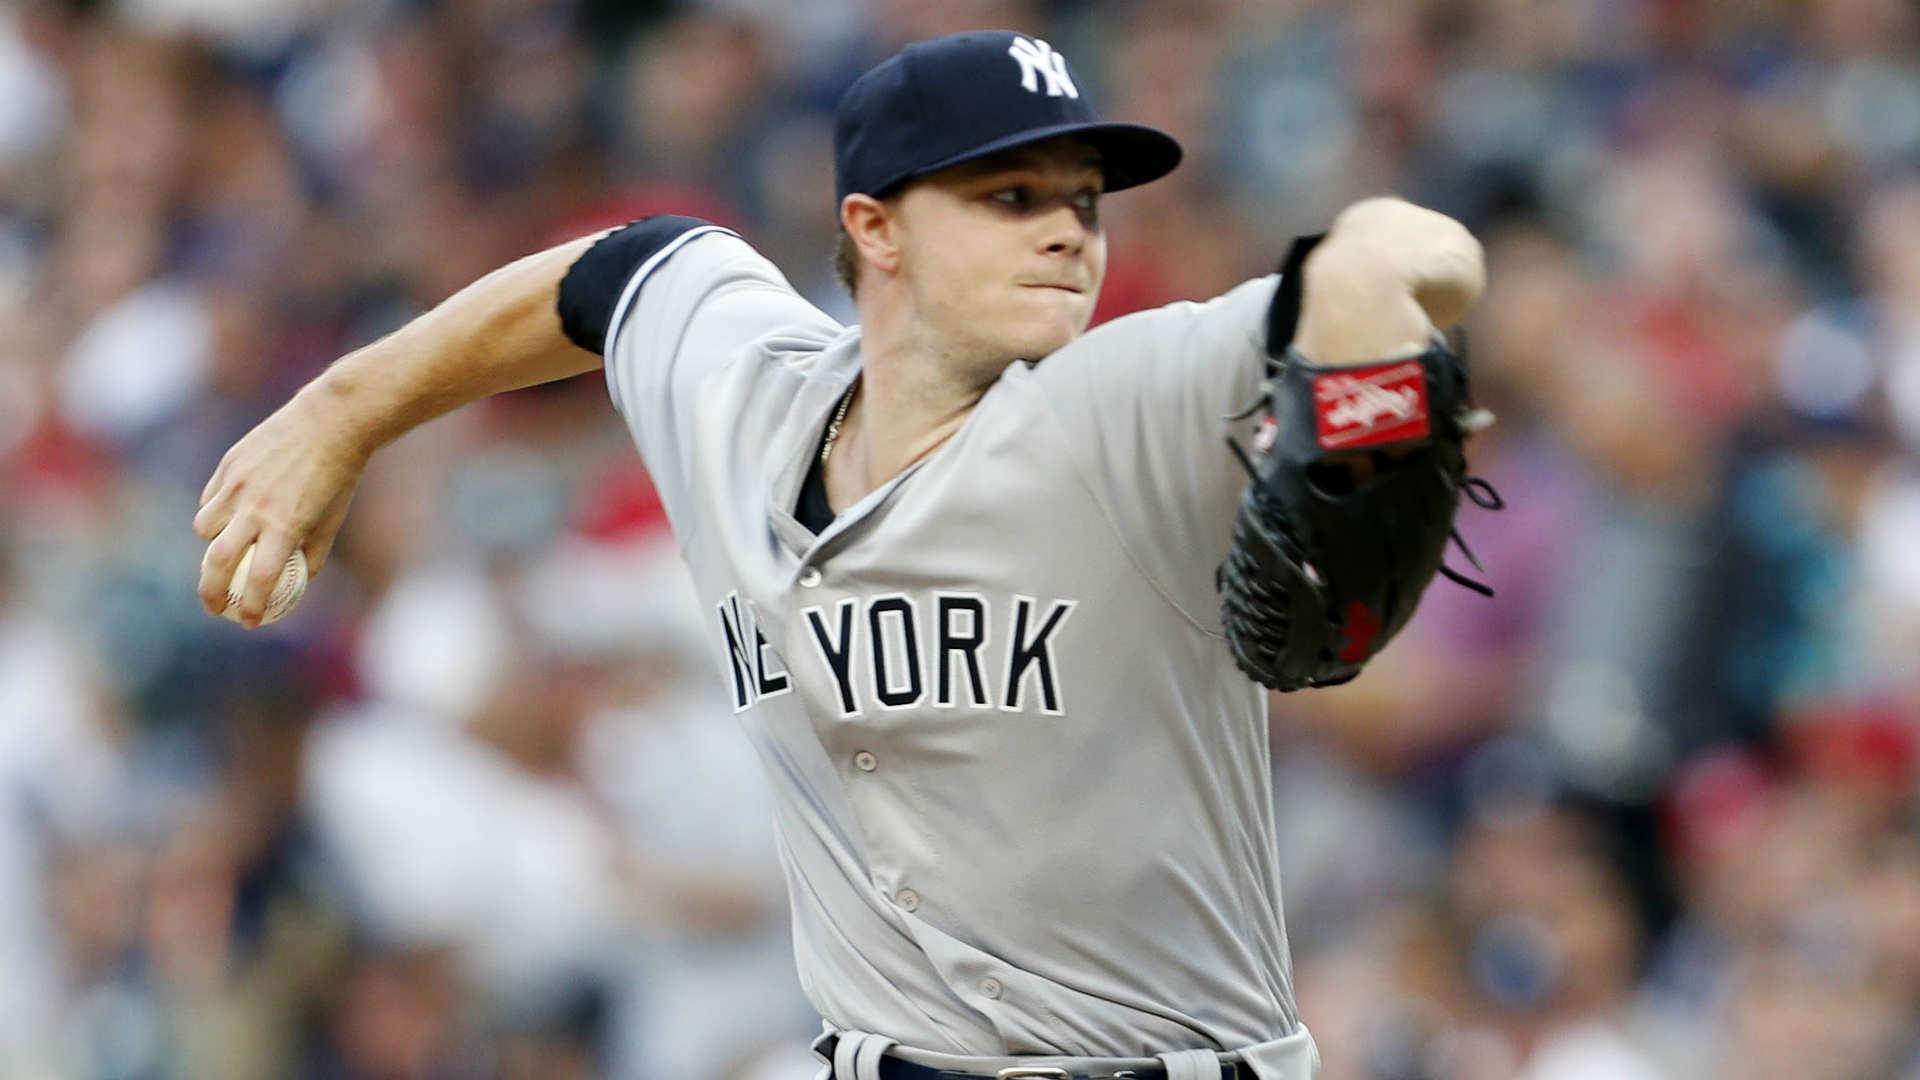 MLB trade rumors: Multiple teams scouting Yankees starter Sonny Gray